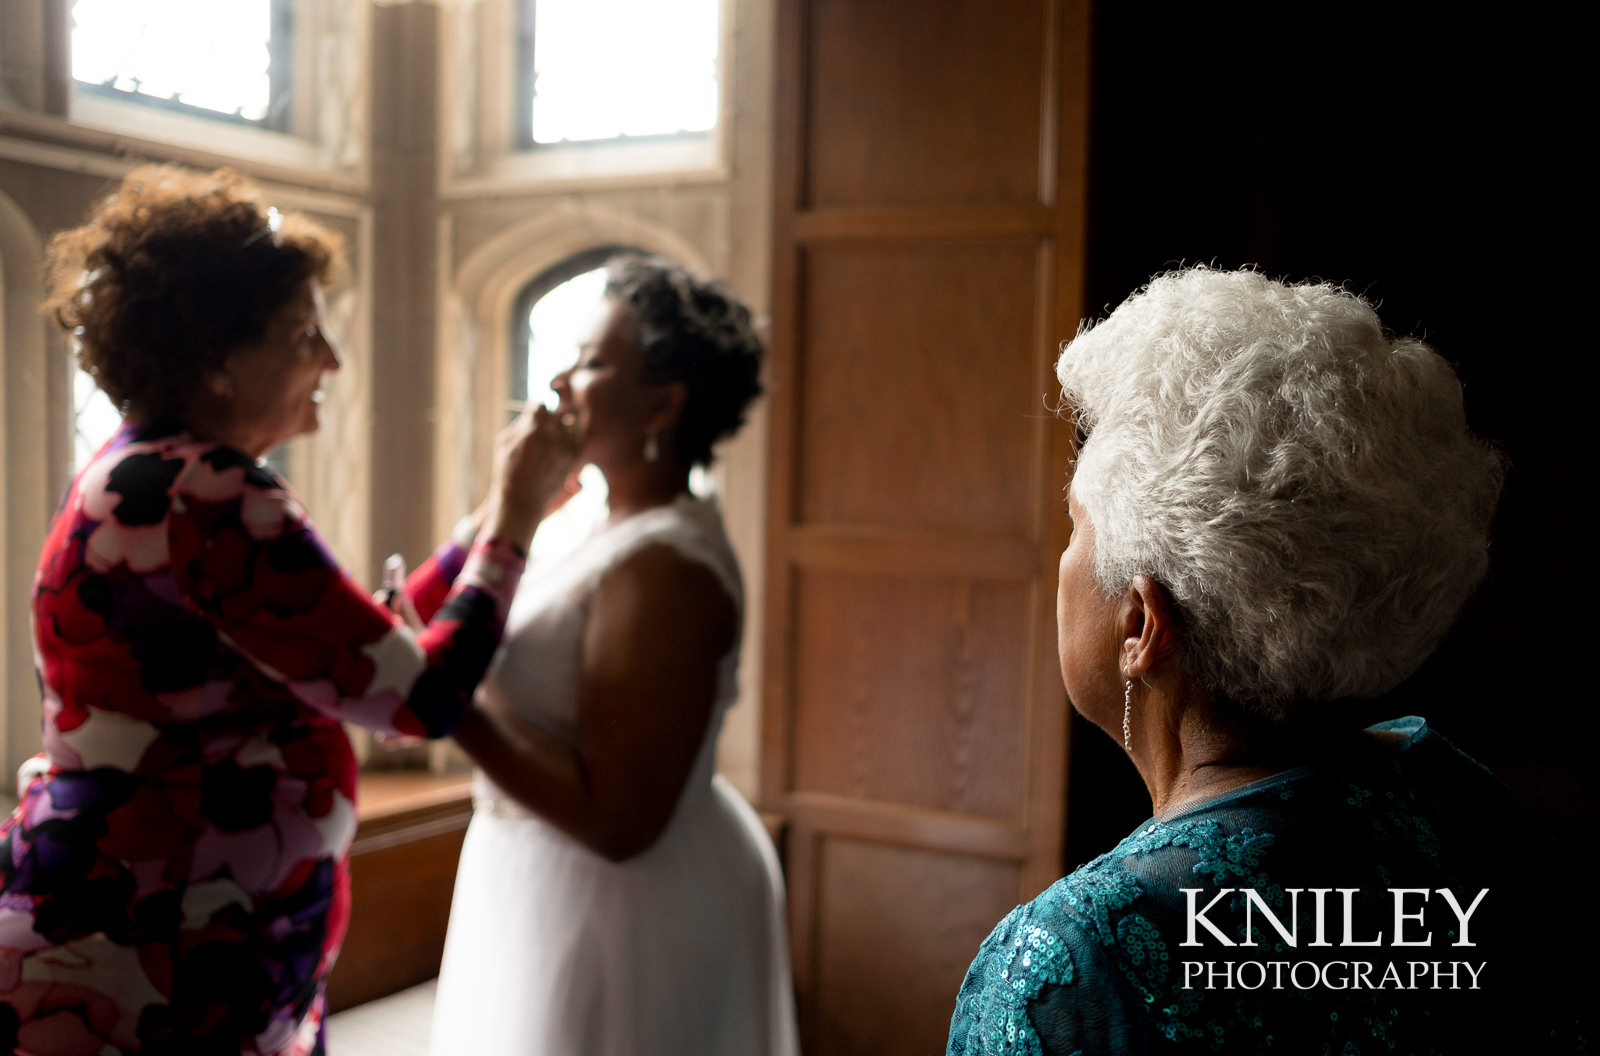 Rochester Colgate Divinity School Wedding - Classic Rochester NY Wedding - 006-XT2A4150.jpg